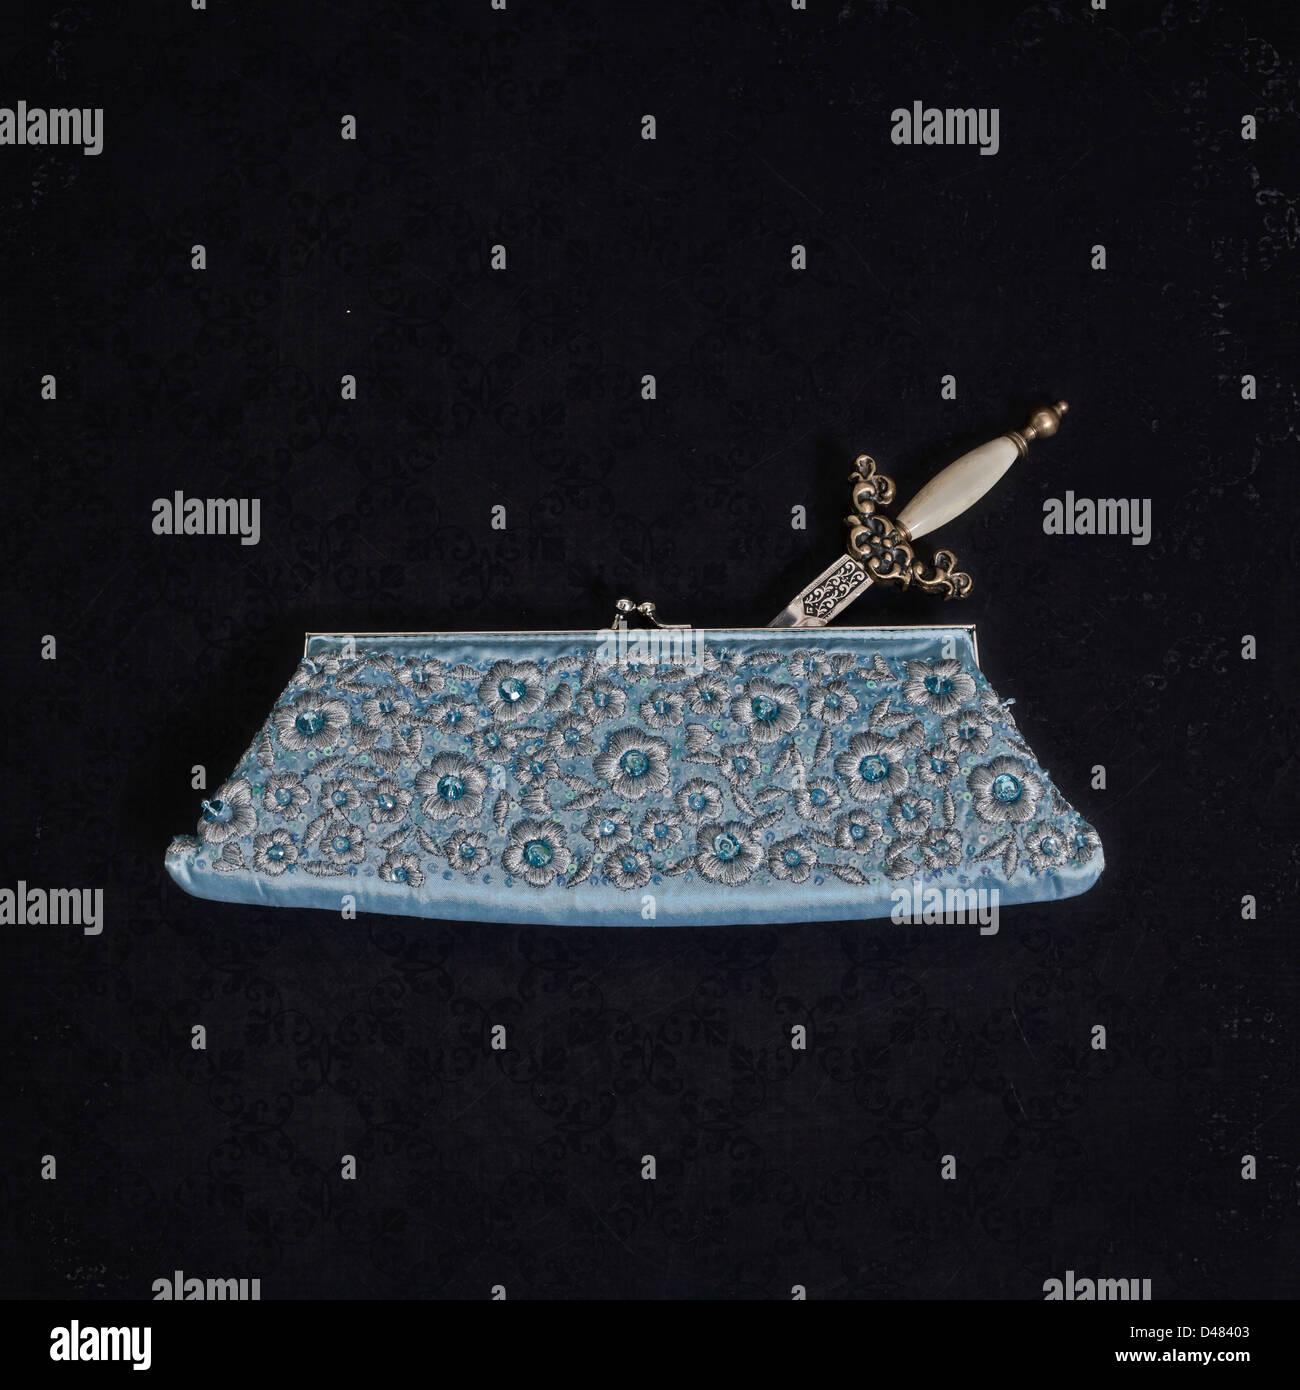 a dagger in an elegant handbag - Stock Image